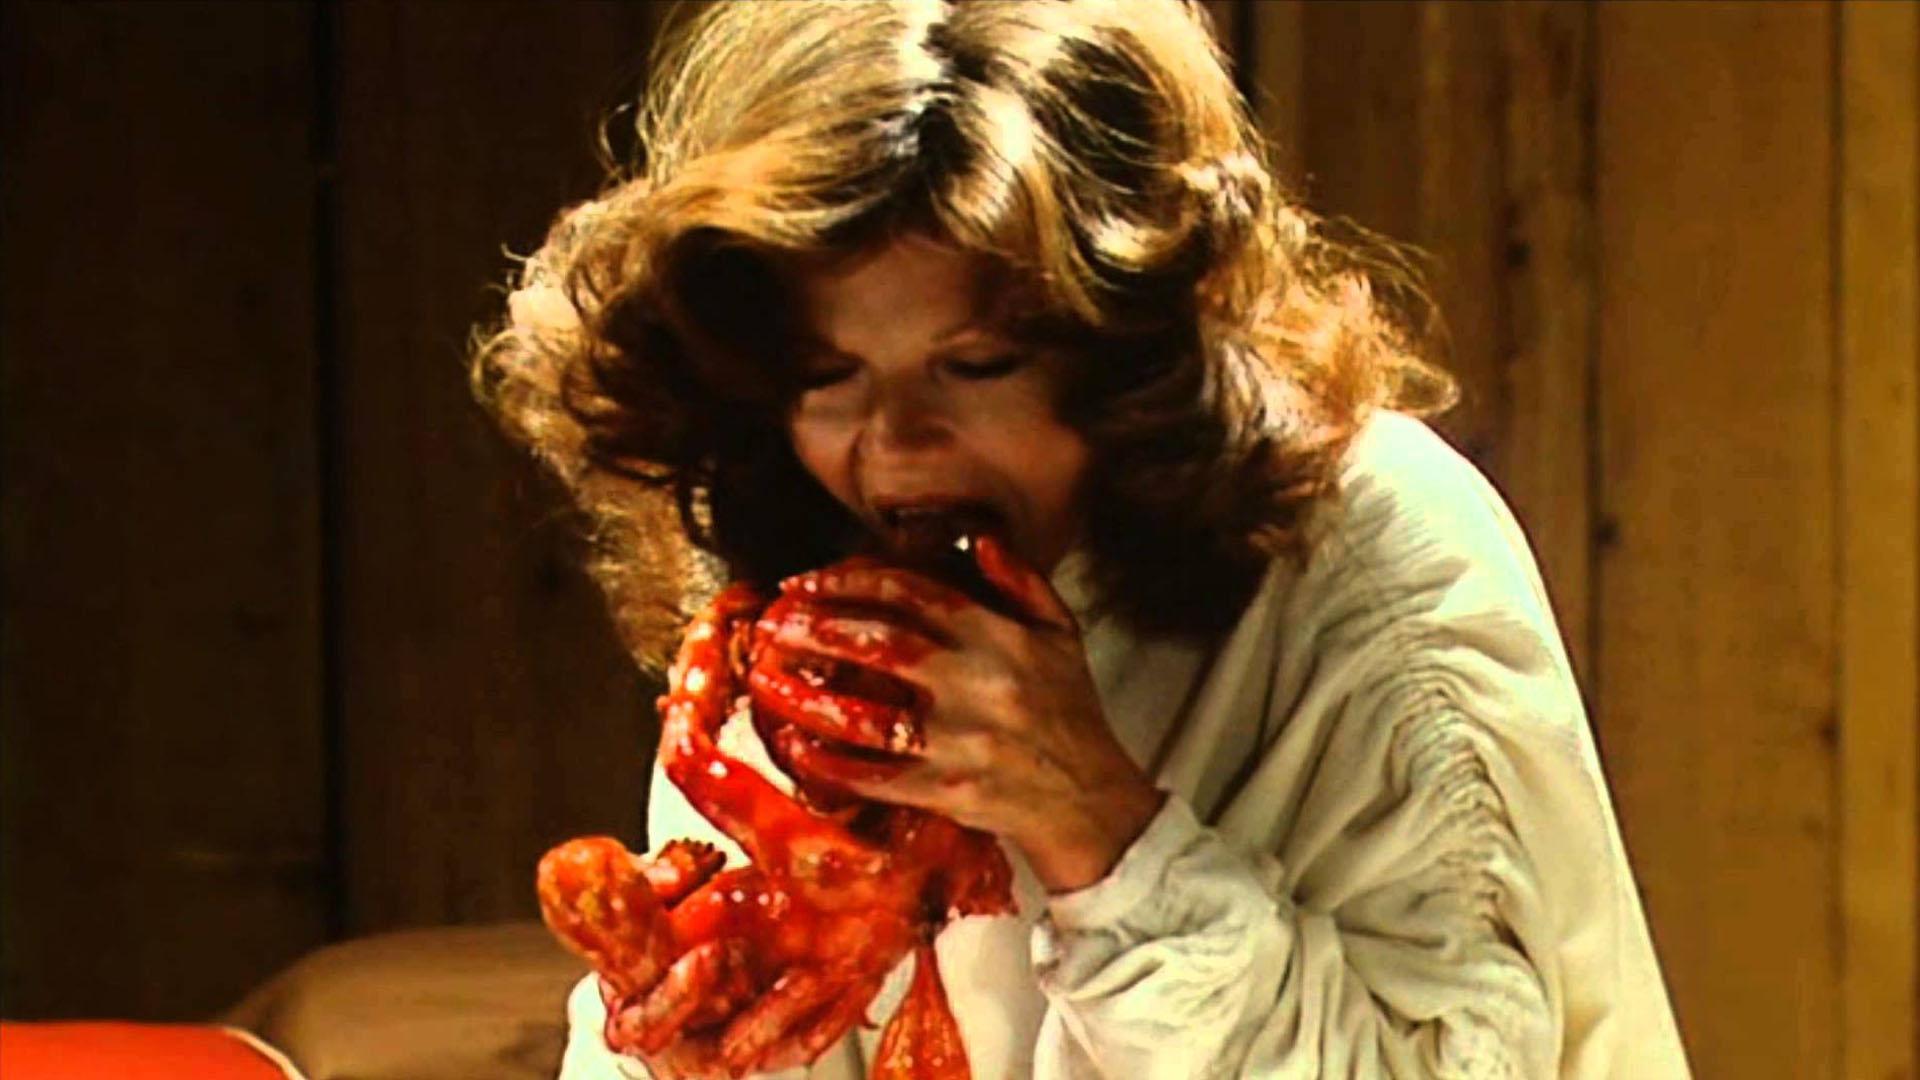 21. Cronenberg, David, director. The Brood. 1979.